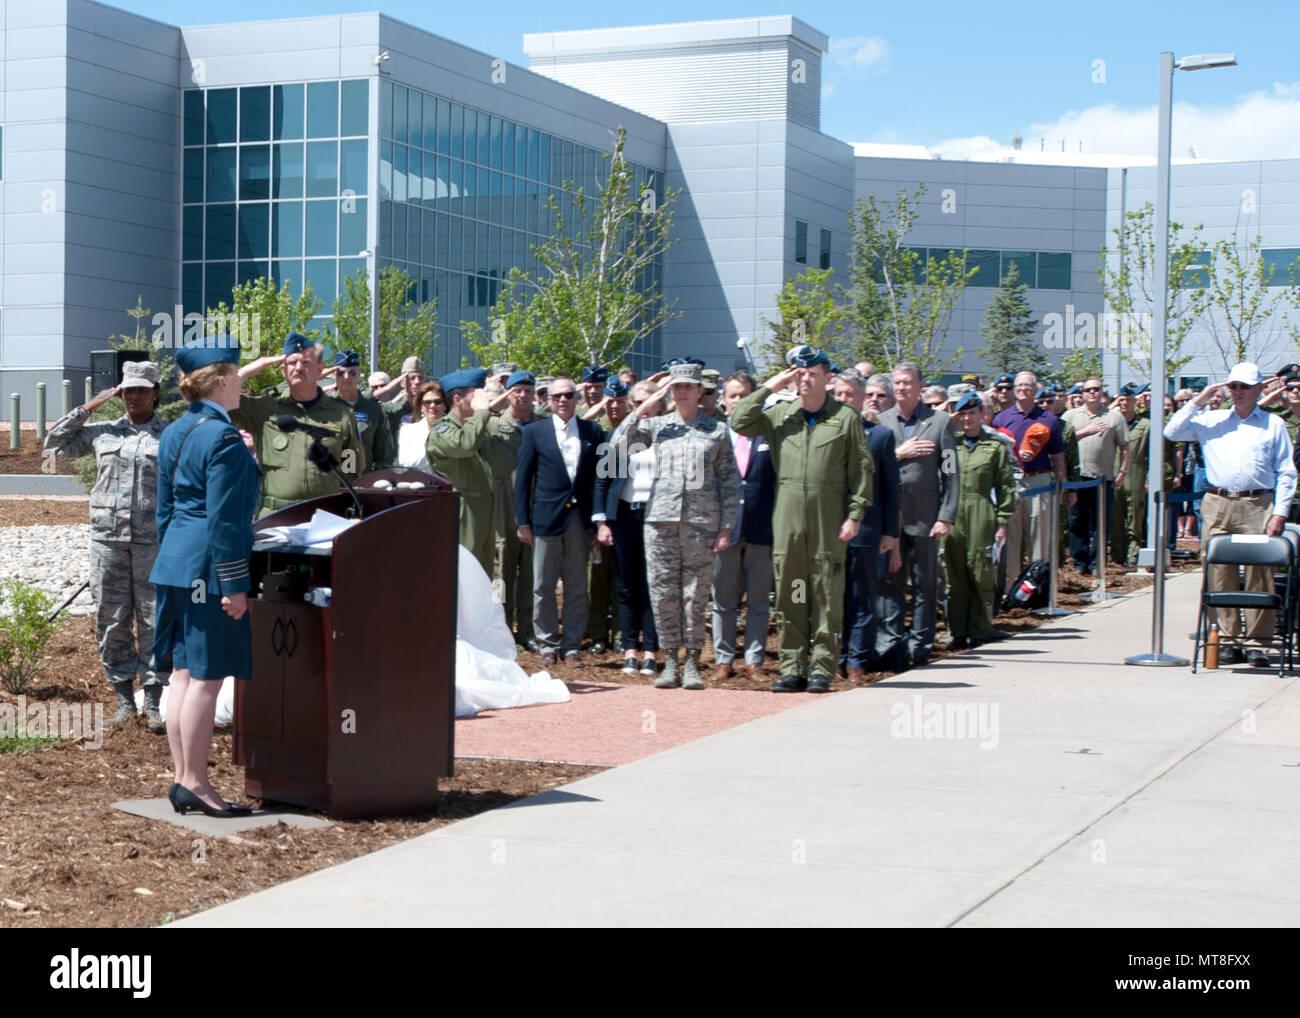 Royal Canadian Air Force Honorary Colonel Loreena Mckennitt Sings